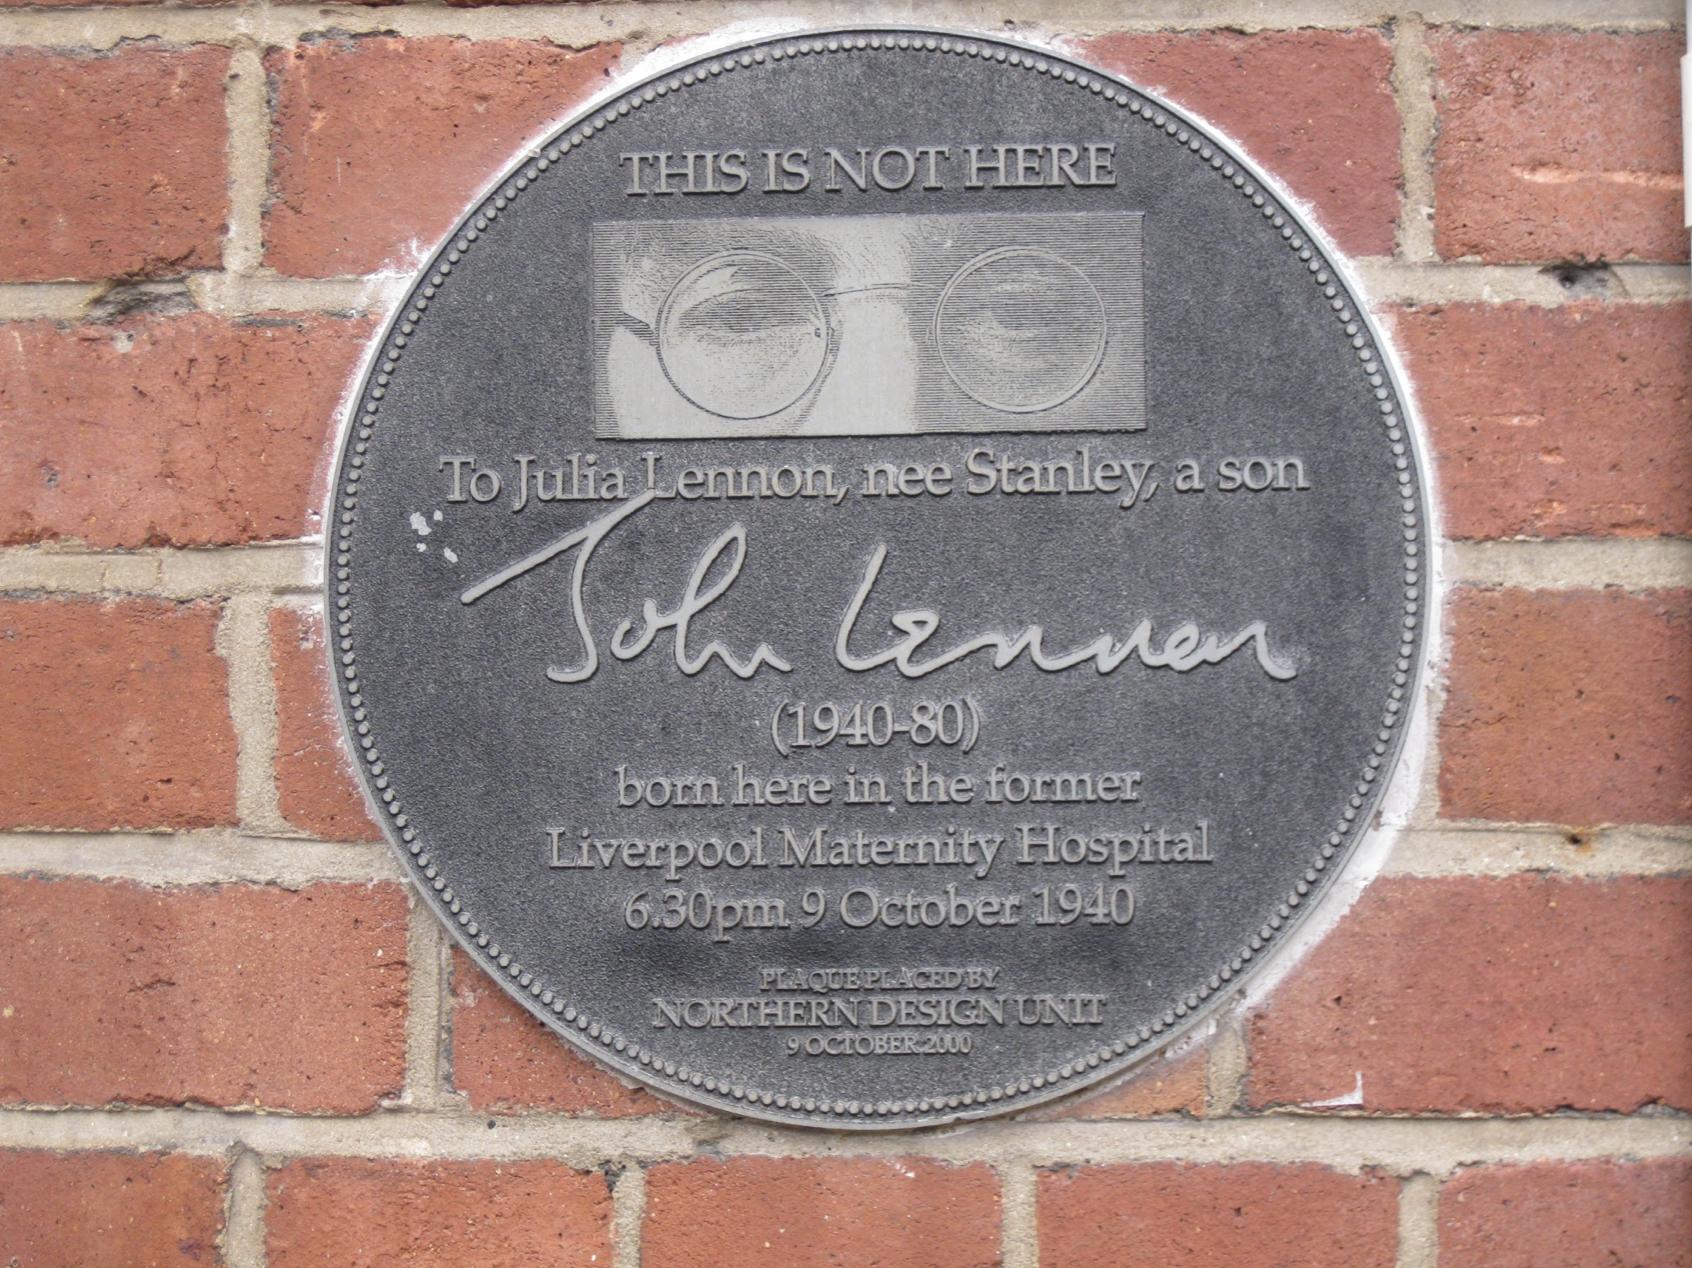 Where John Lennon was Born